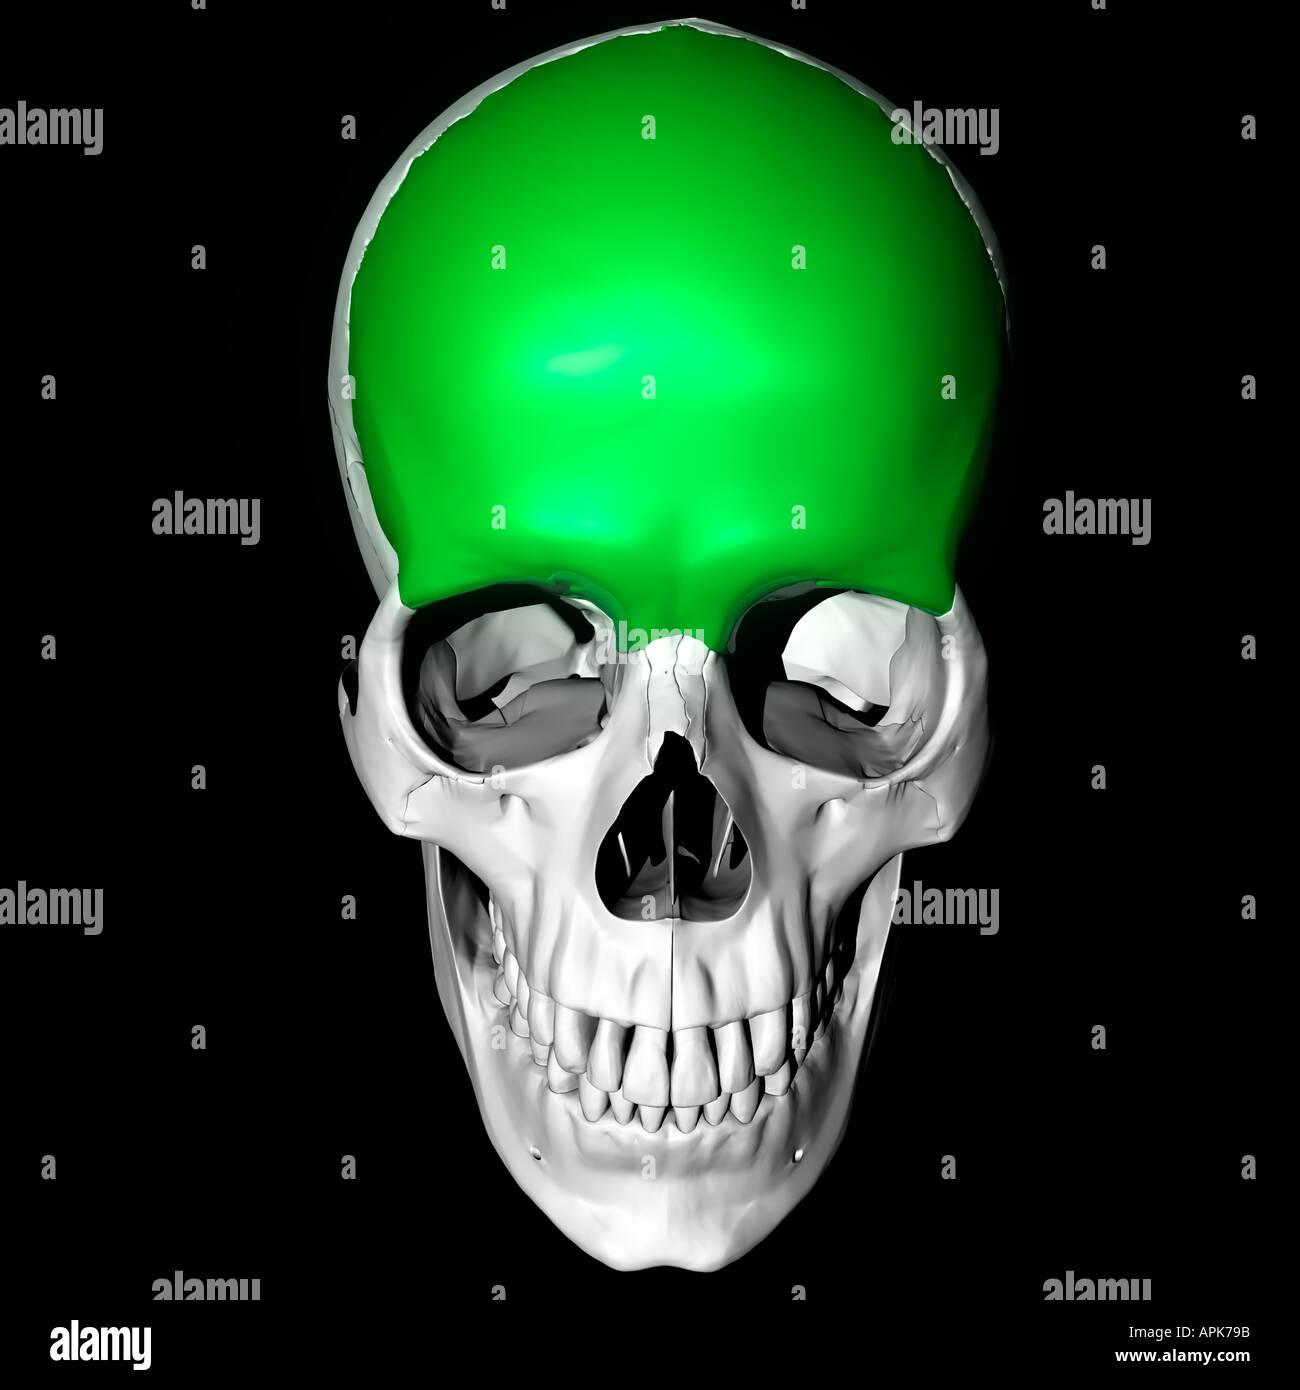 Frontal Bone highlighted on human skull Stock Photo: 2930586 - Alamy